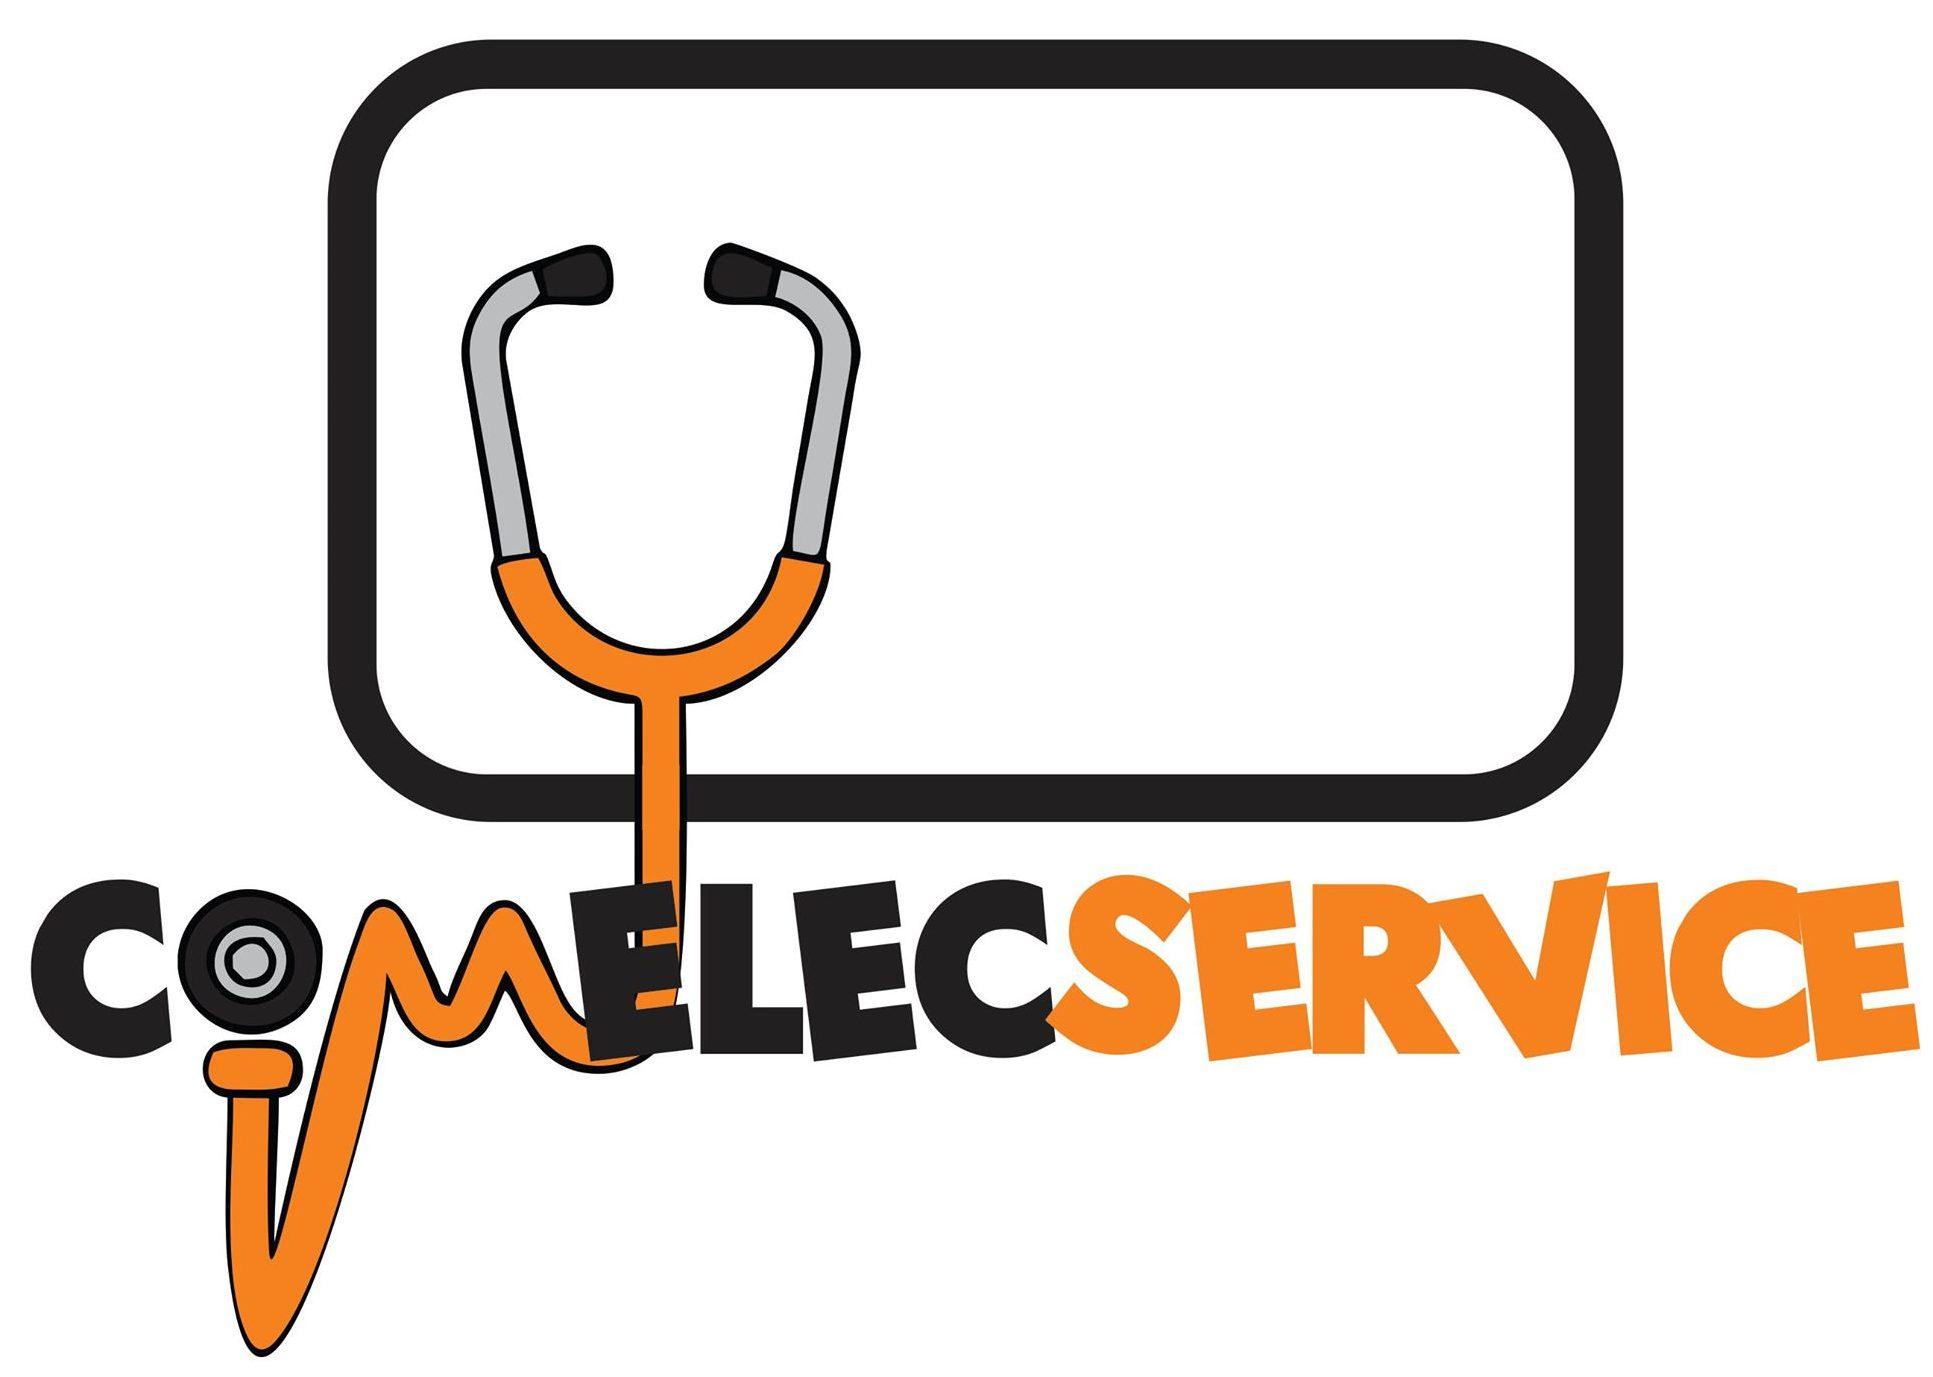 Comelec Service (servicio técnico integral)